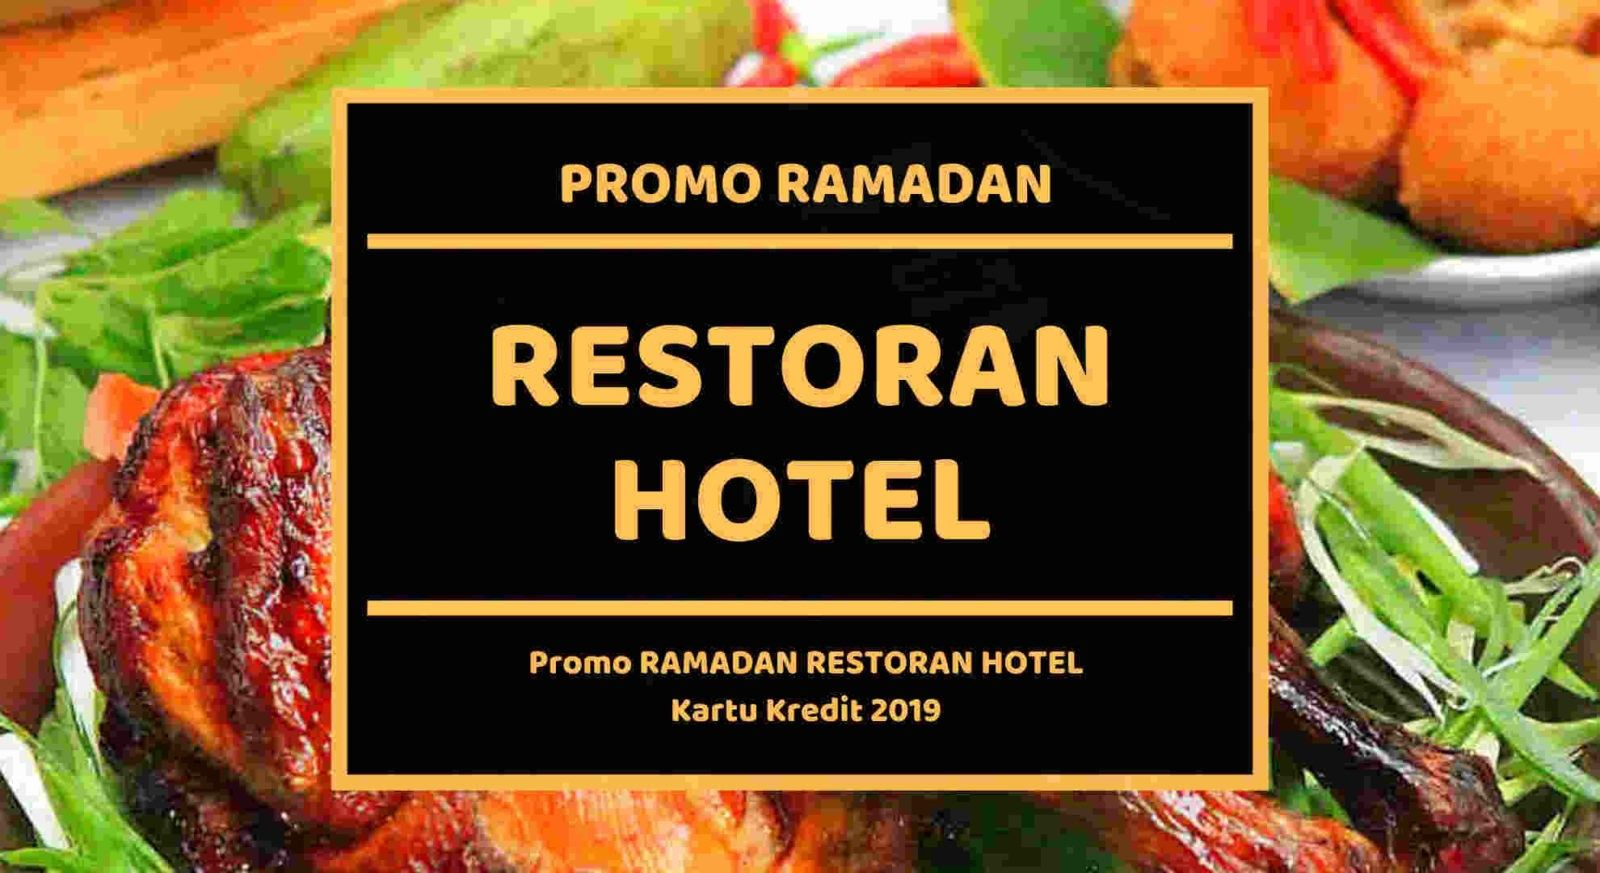 Promo Ramadan Restoran Hotel Hemat 25 Travelspromo